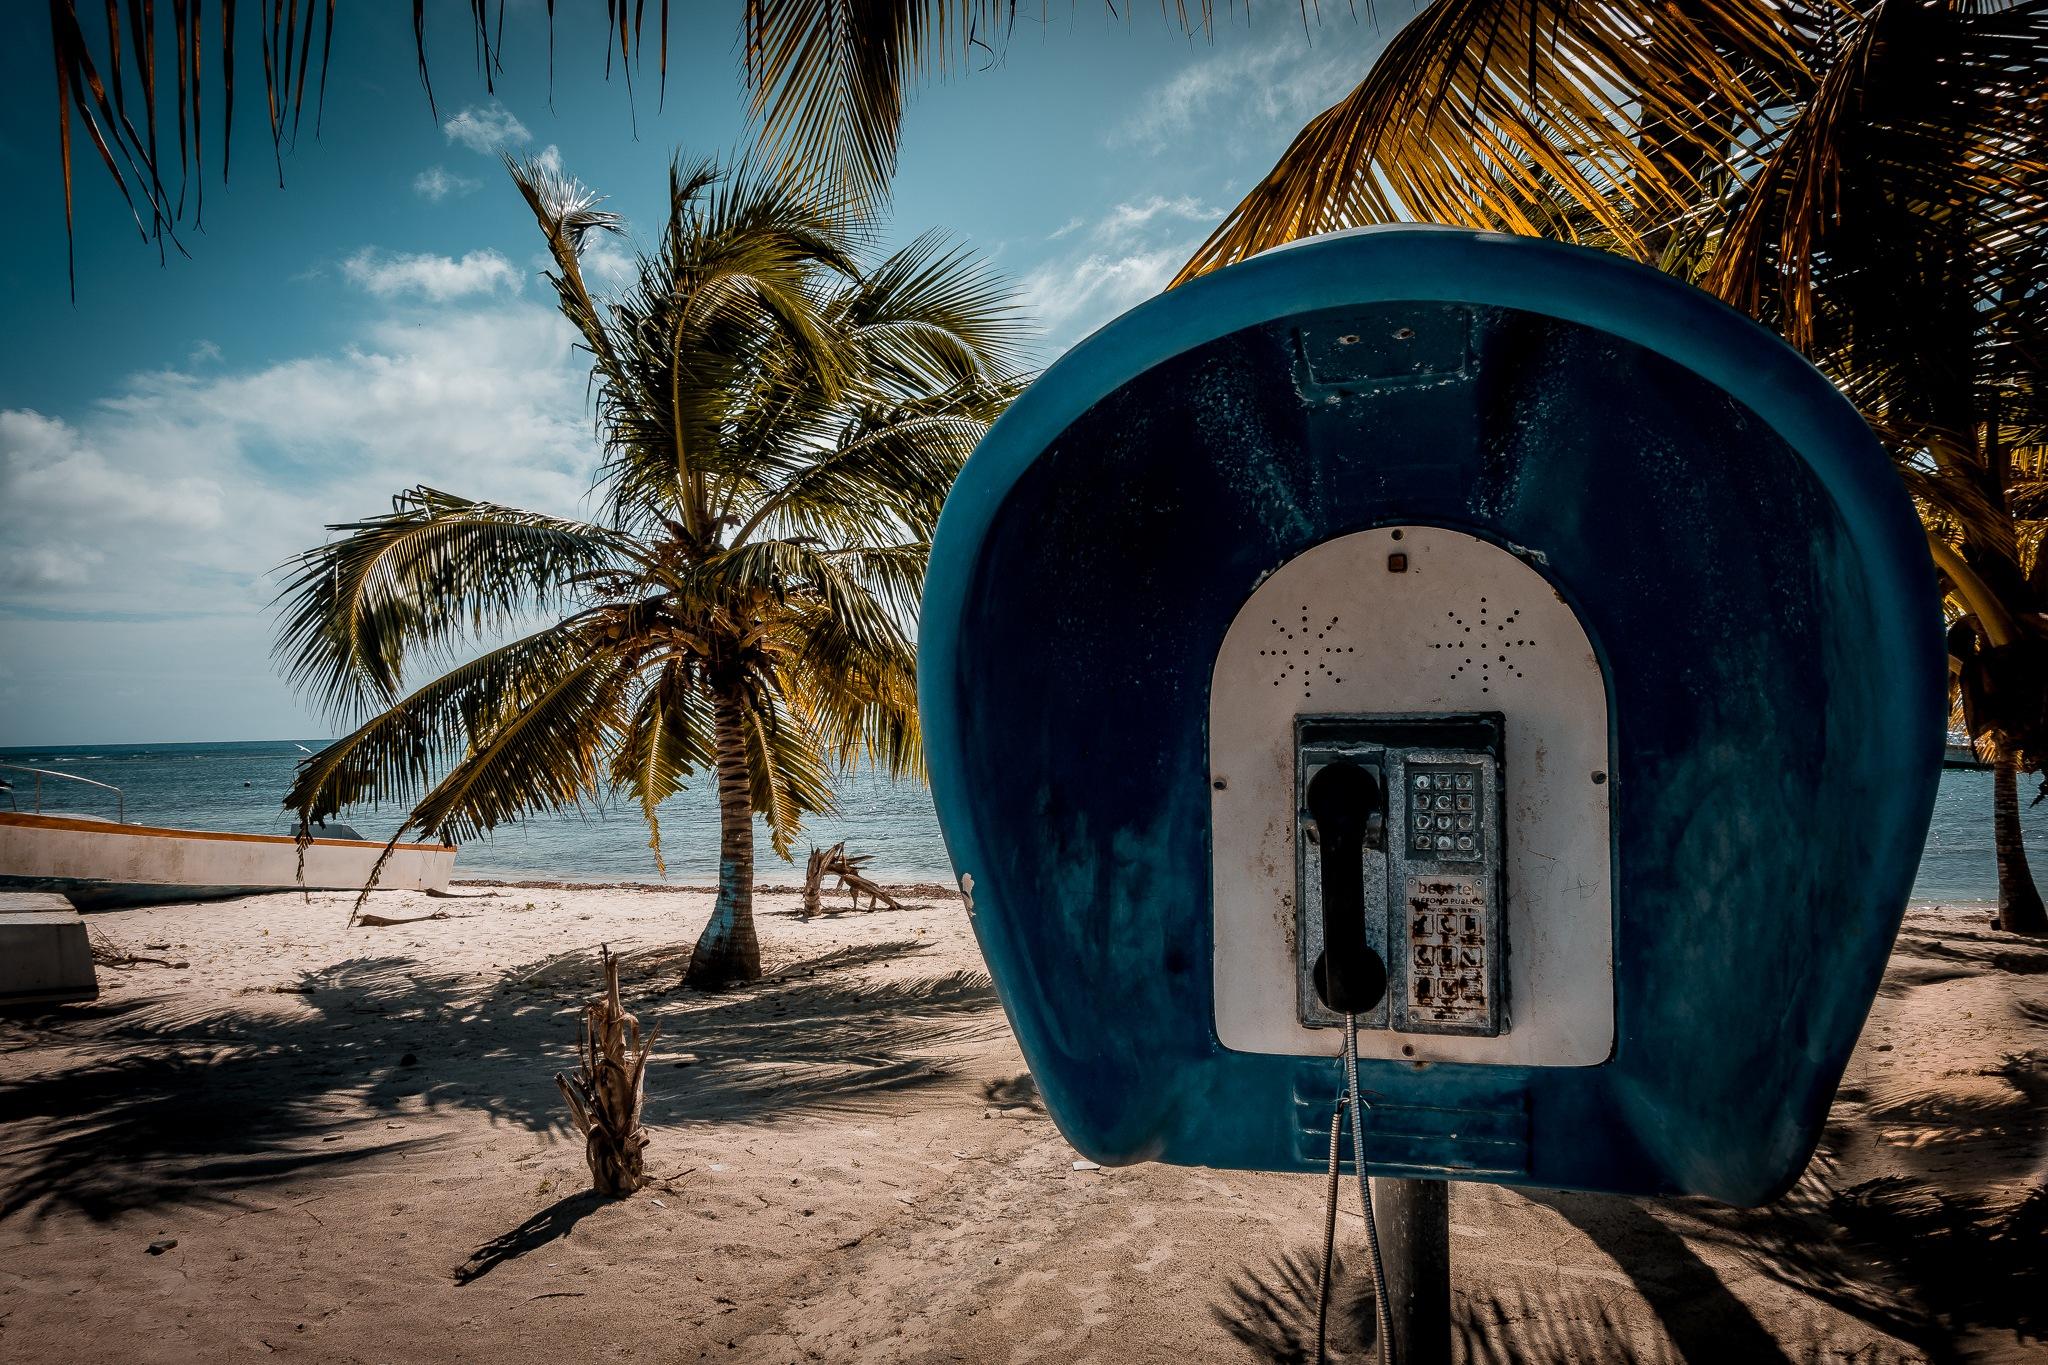 A call for Mr. Robinson Cruso by Andreas Mariotti